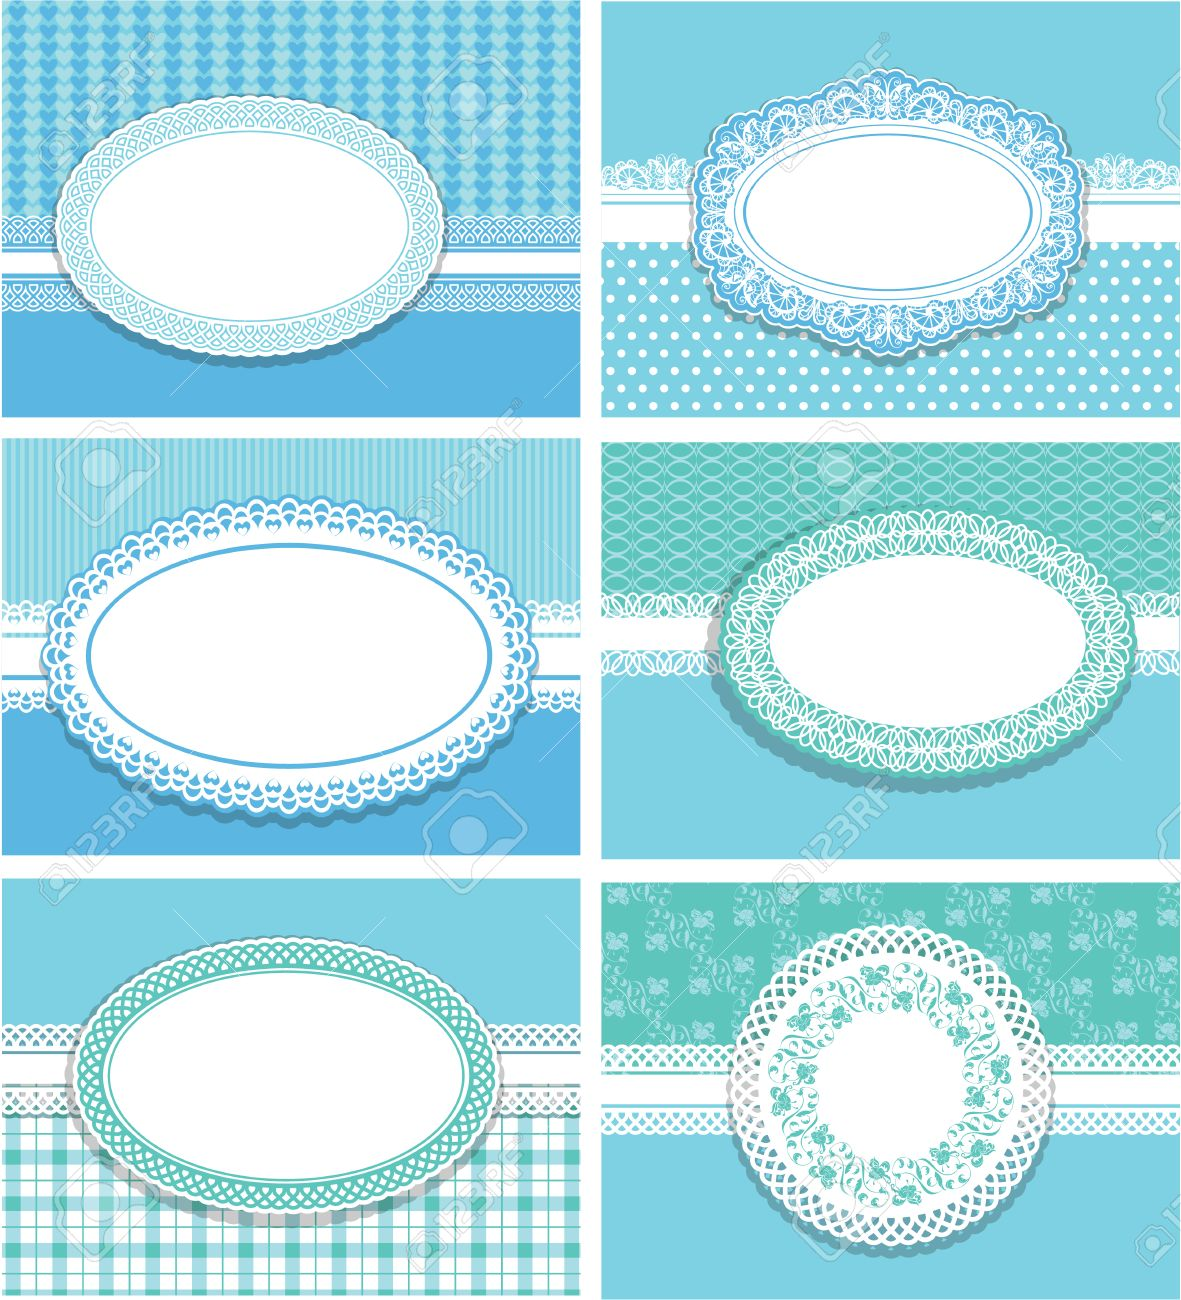 Set Of Horizontal Invitation Cards (for Birthday, Wedding, Baby Shower, Etc.